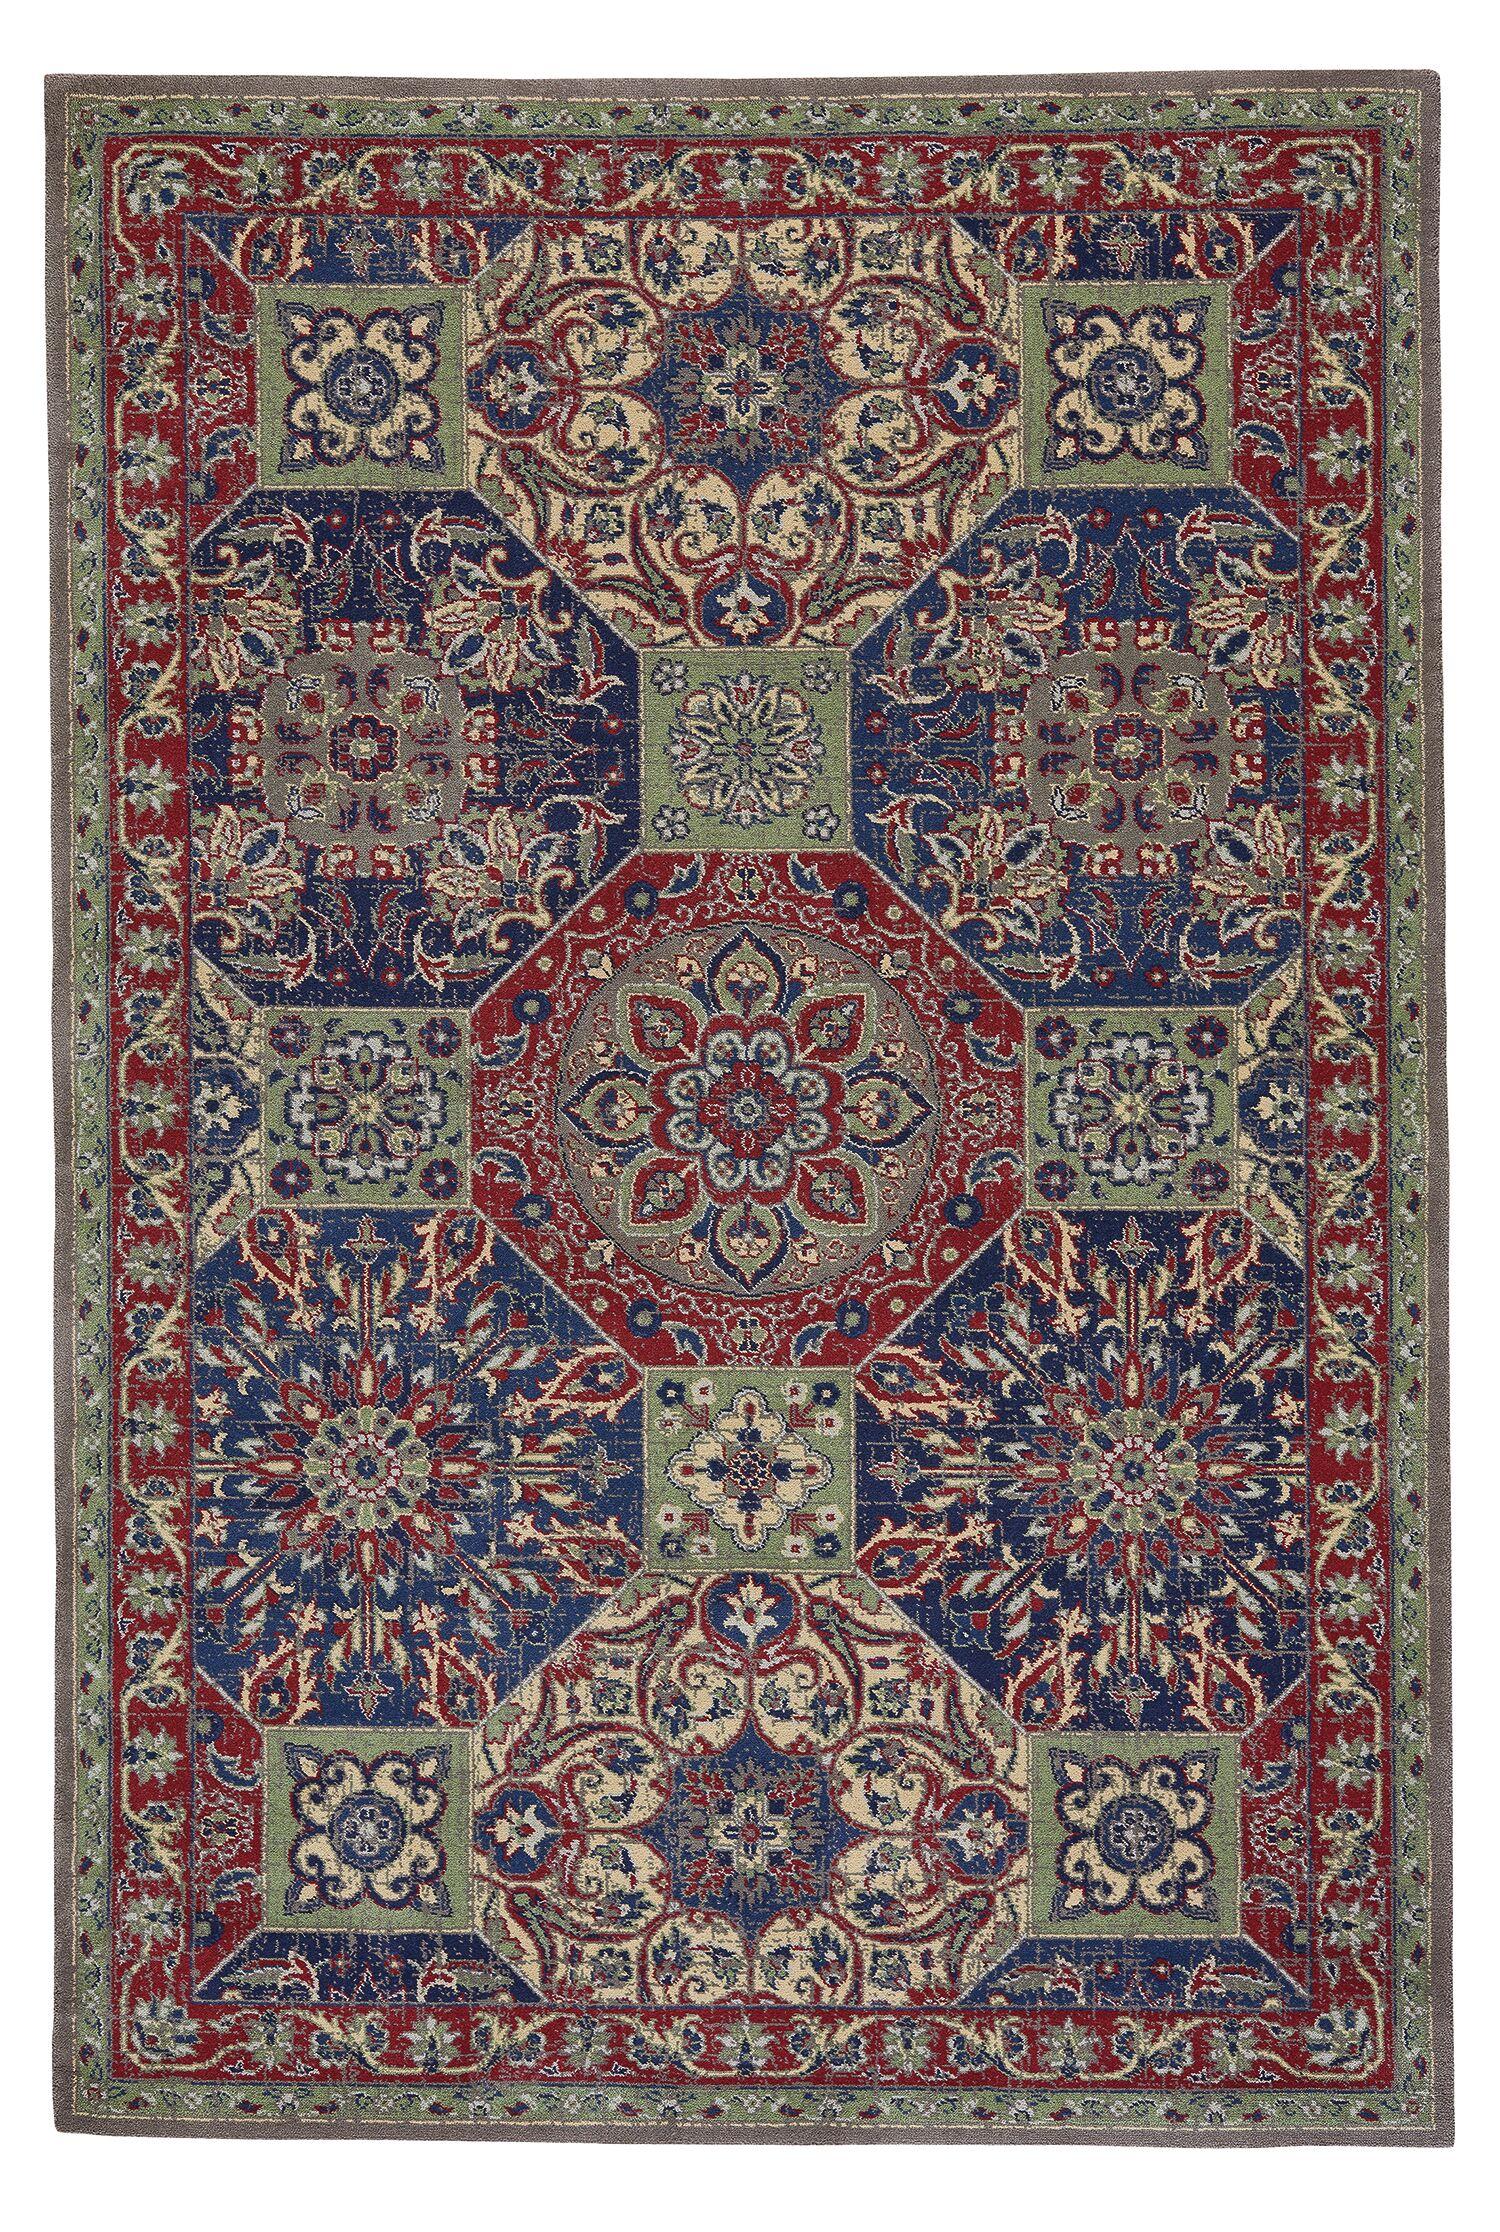 Reardon Panel Wool Blue/Red Area Rug Rug Size: Rectangle 3'11